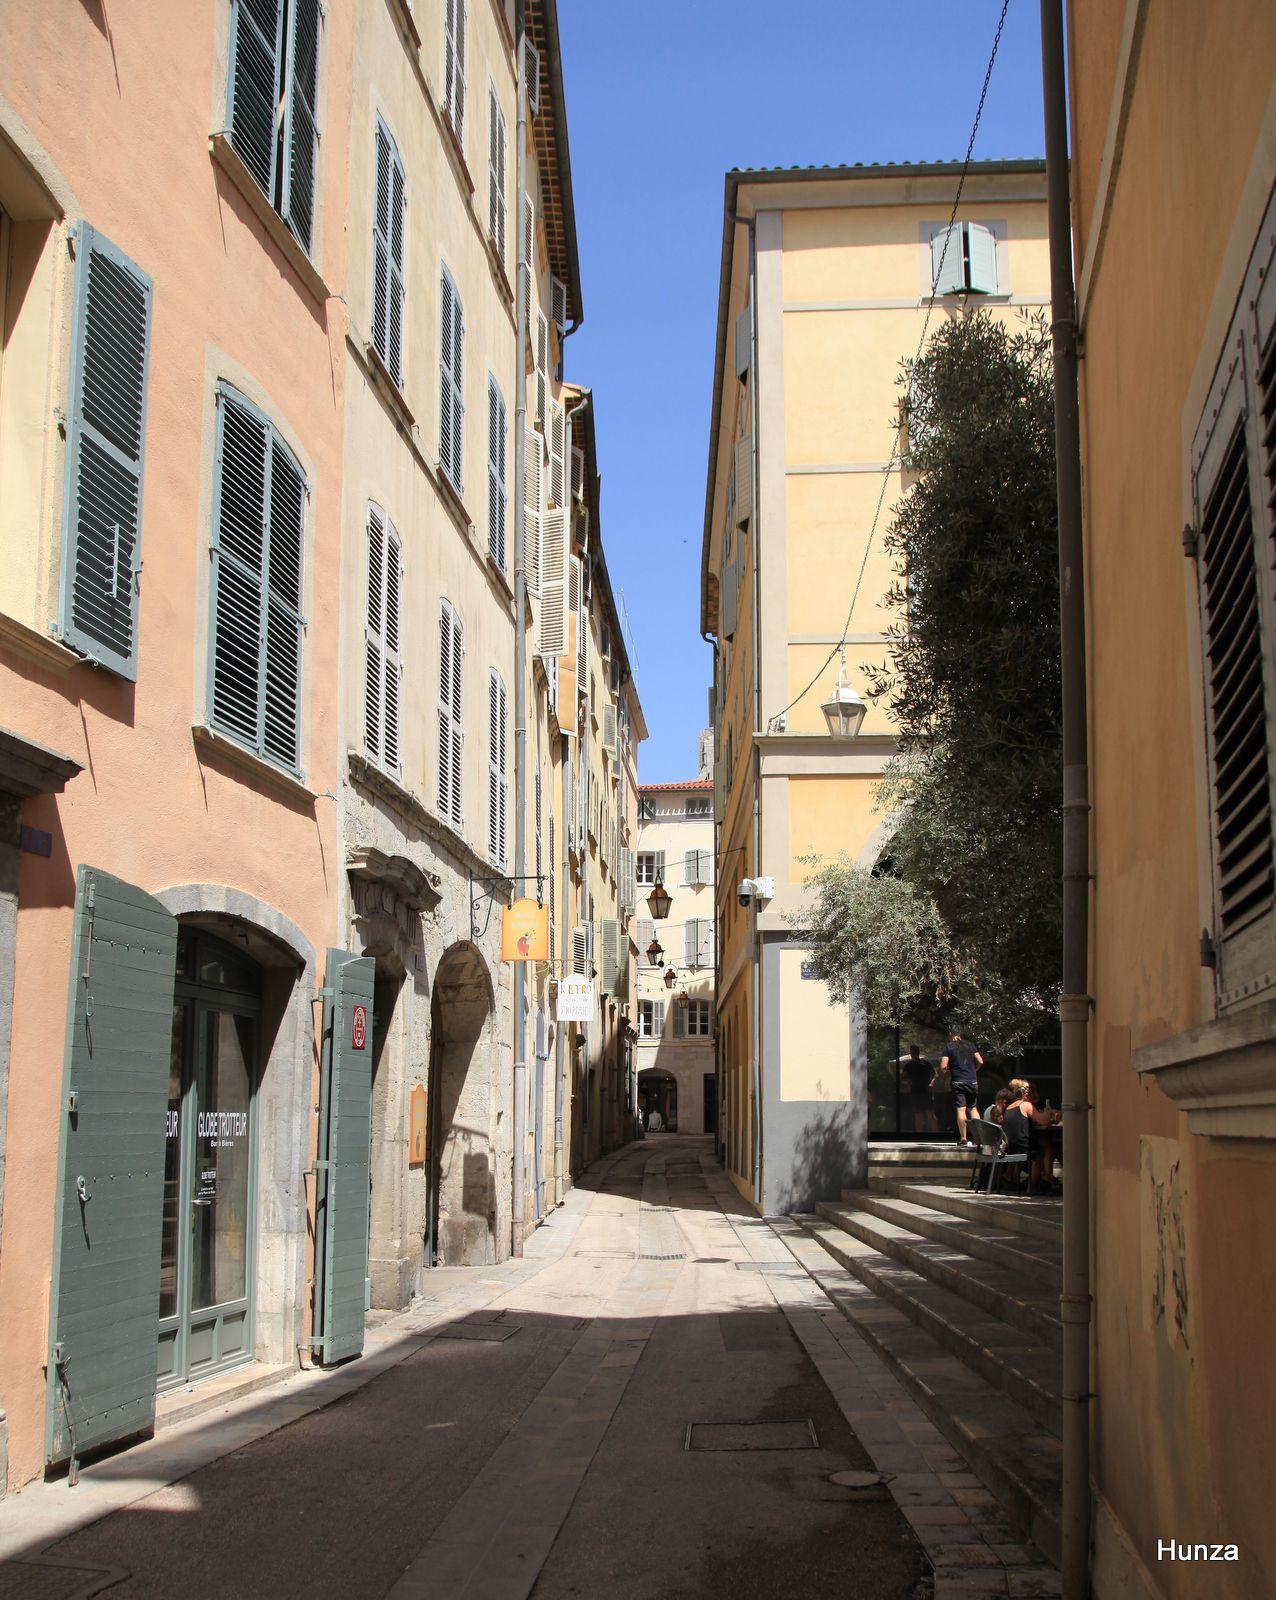 Vieux Toulon